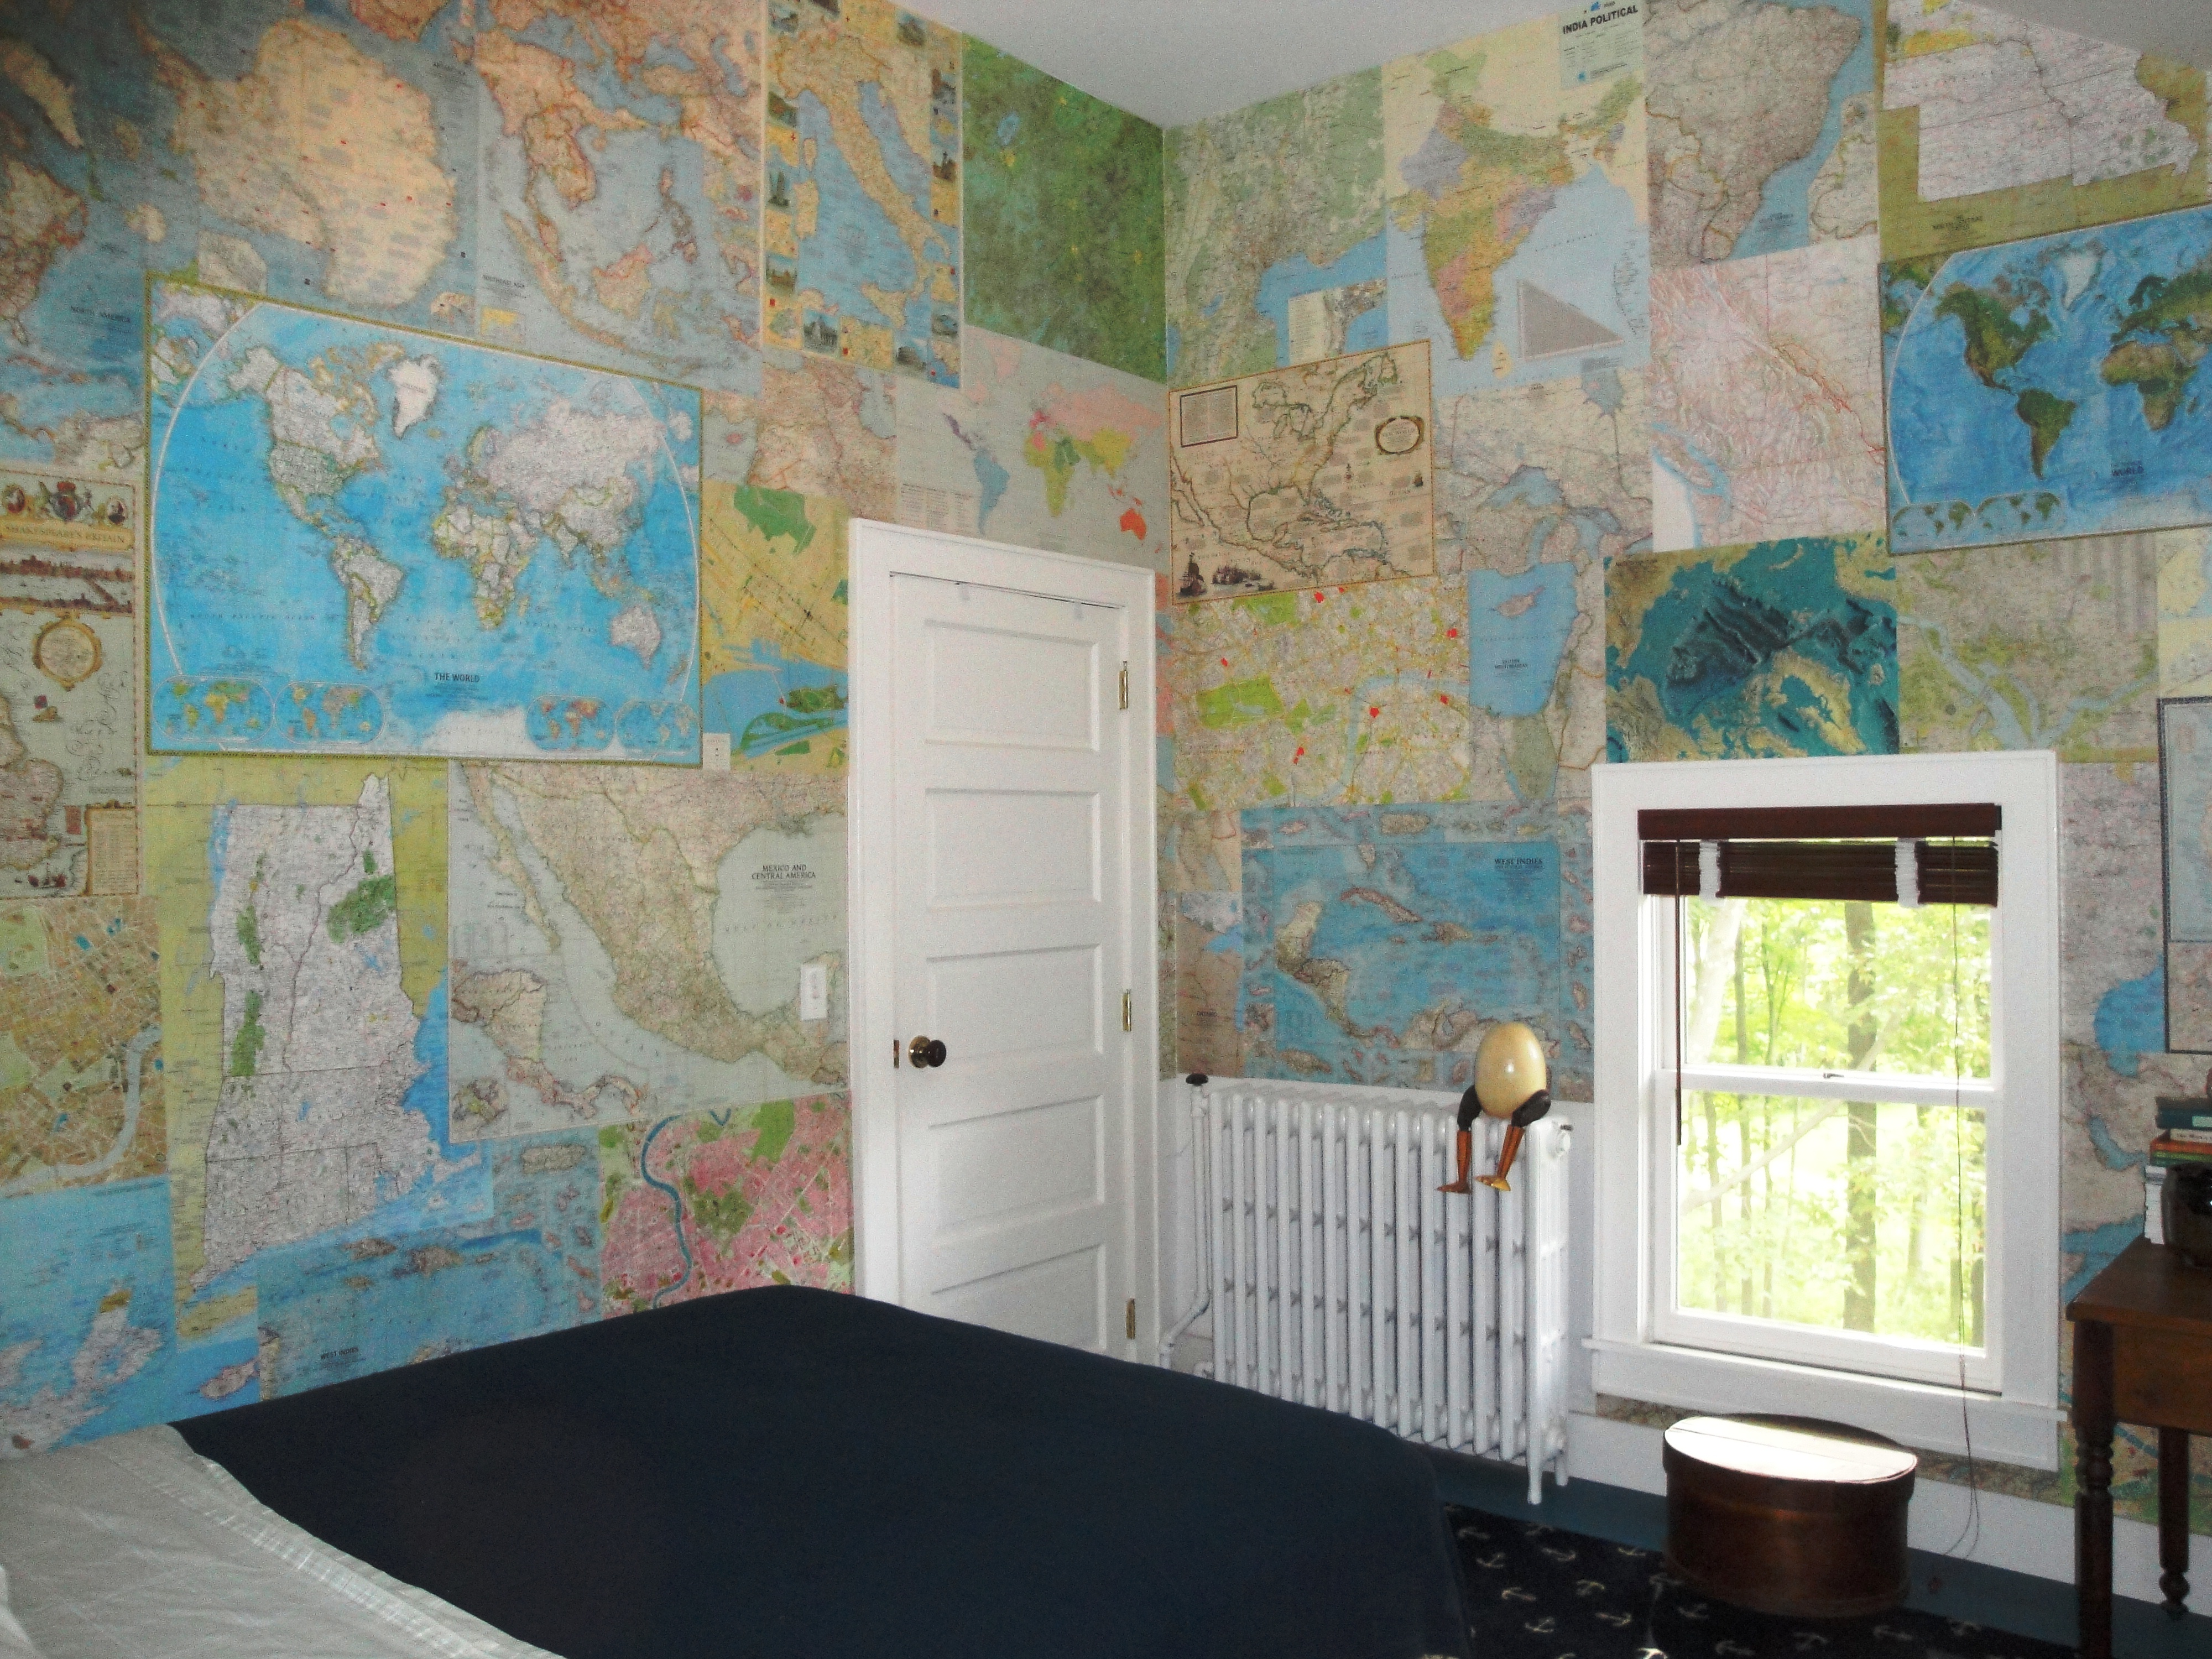 Map Rooms | streetsofsalem